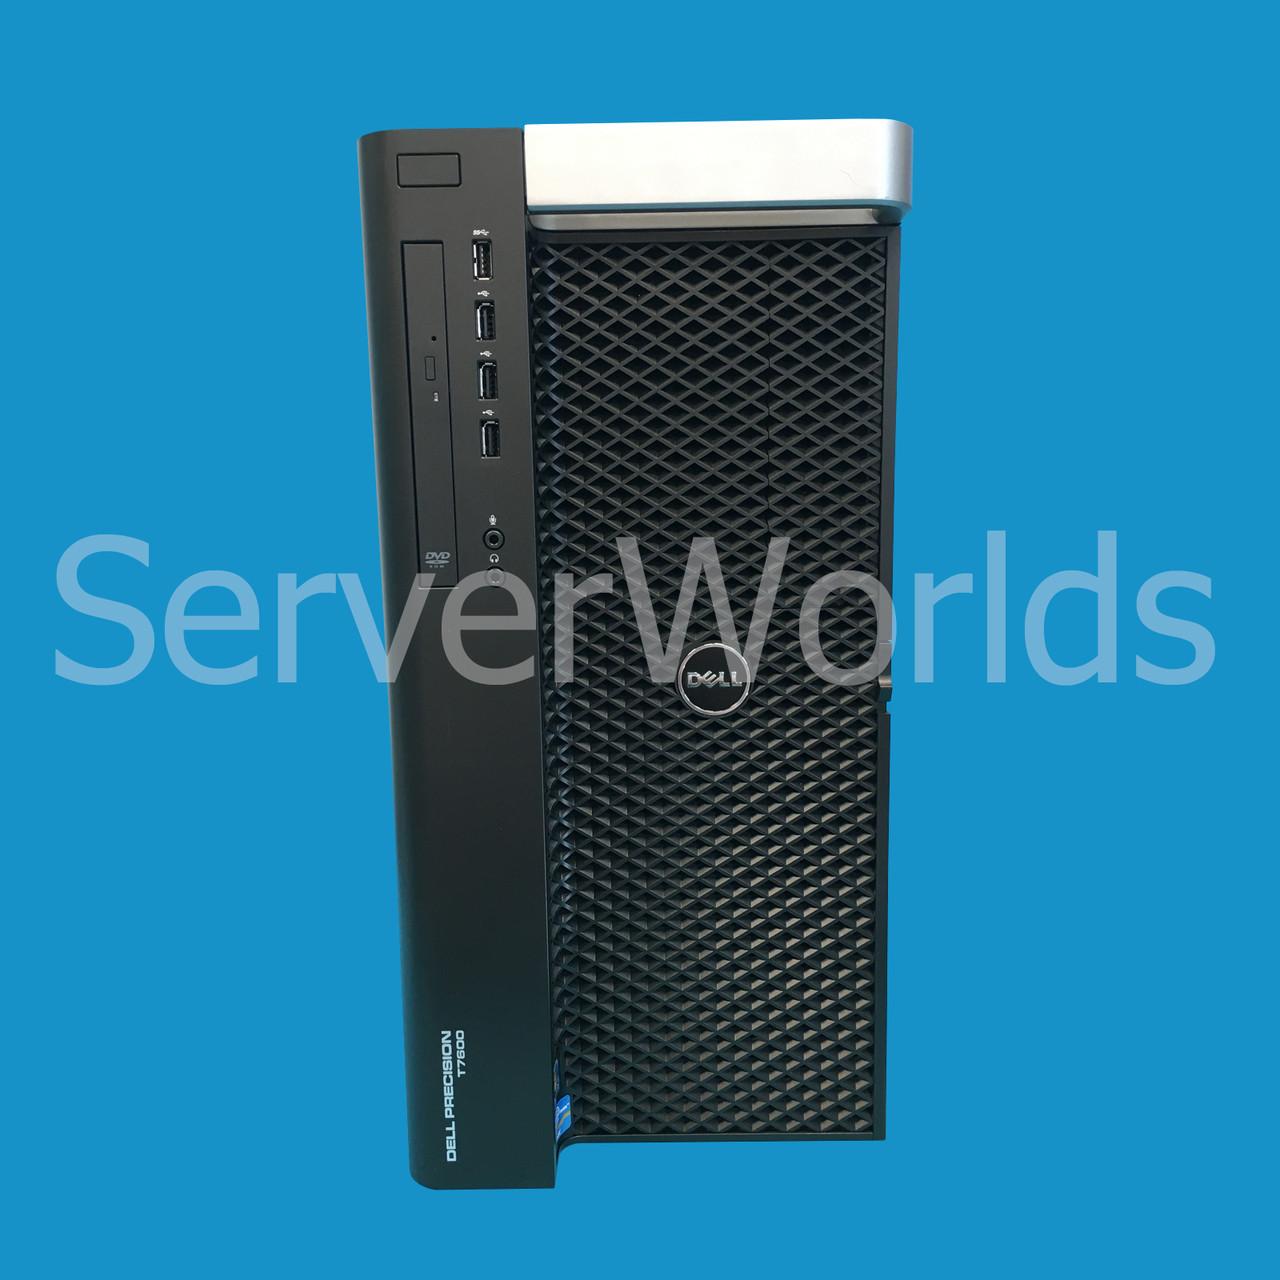 Refurbished Precision T7600 Workstation | Used Precision T7600